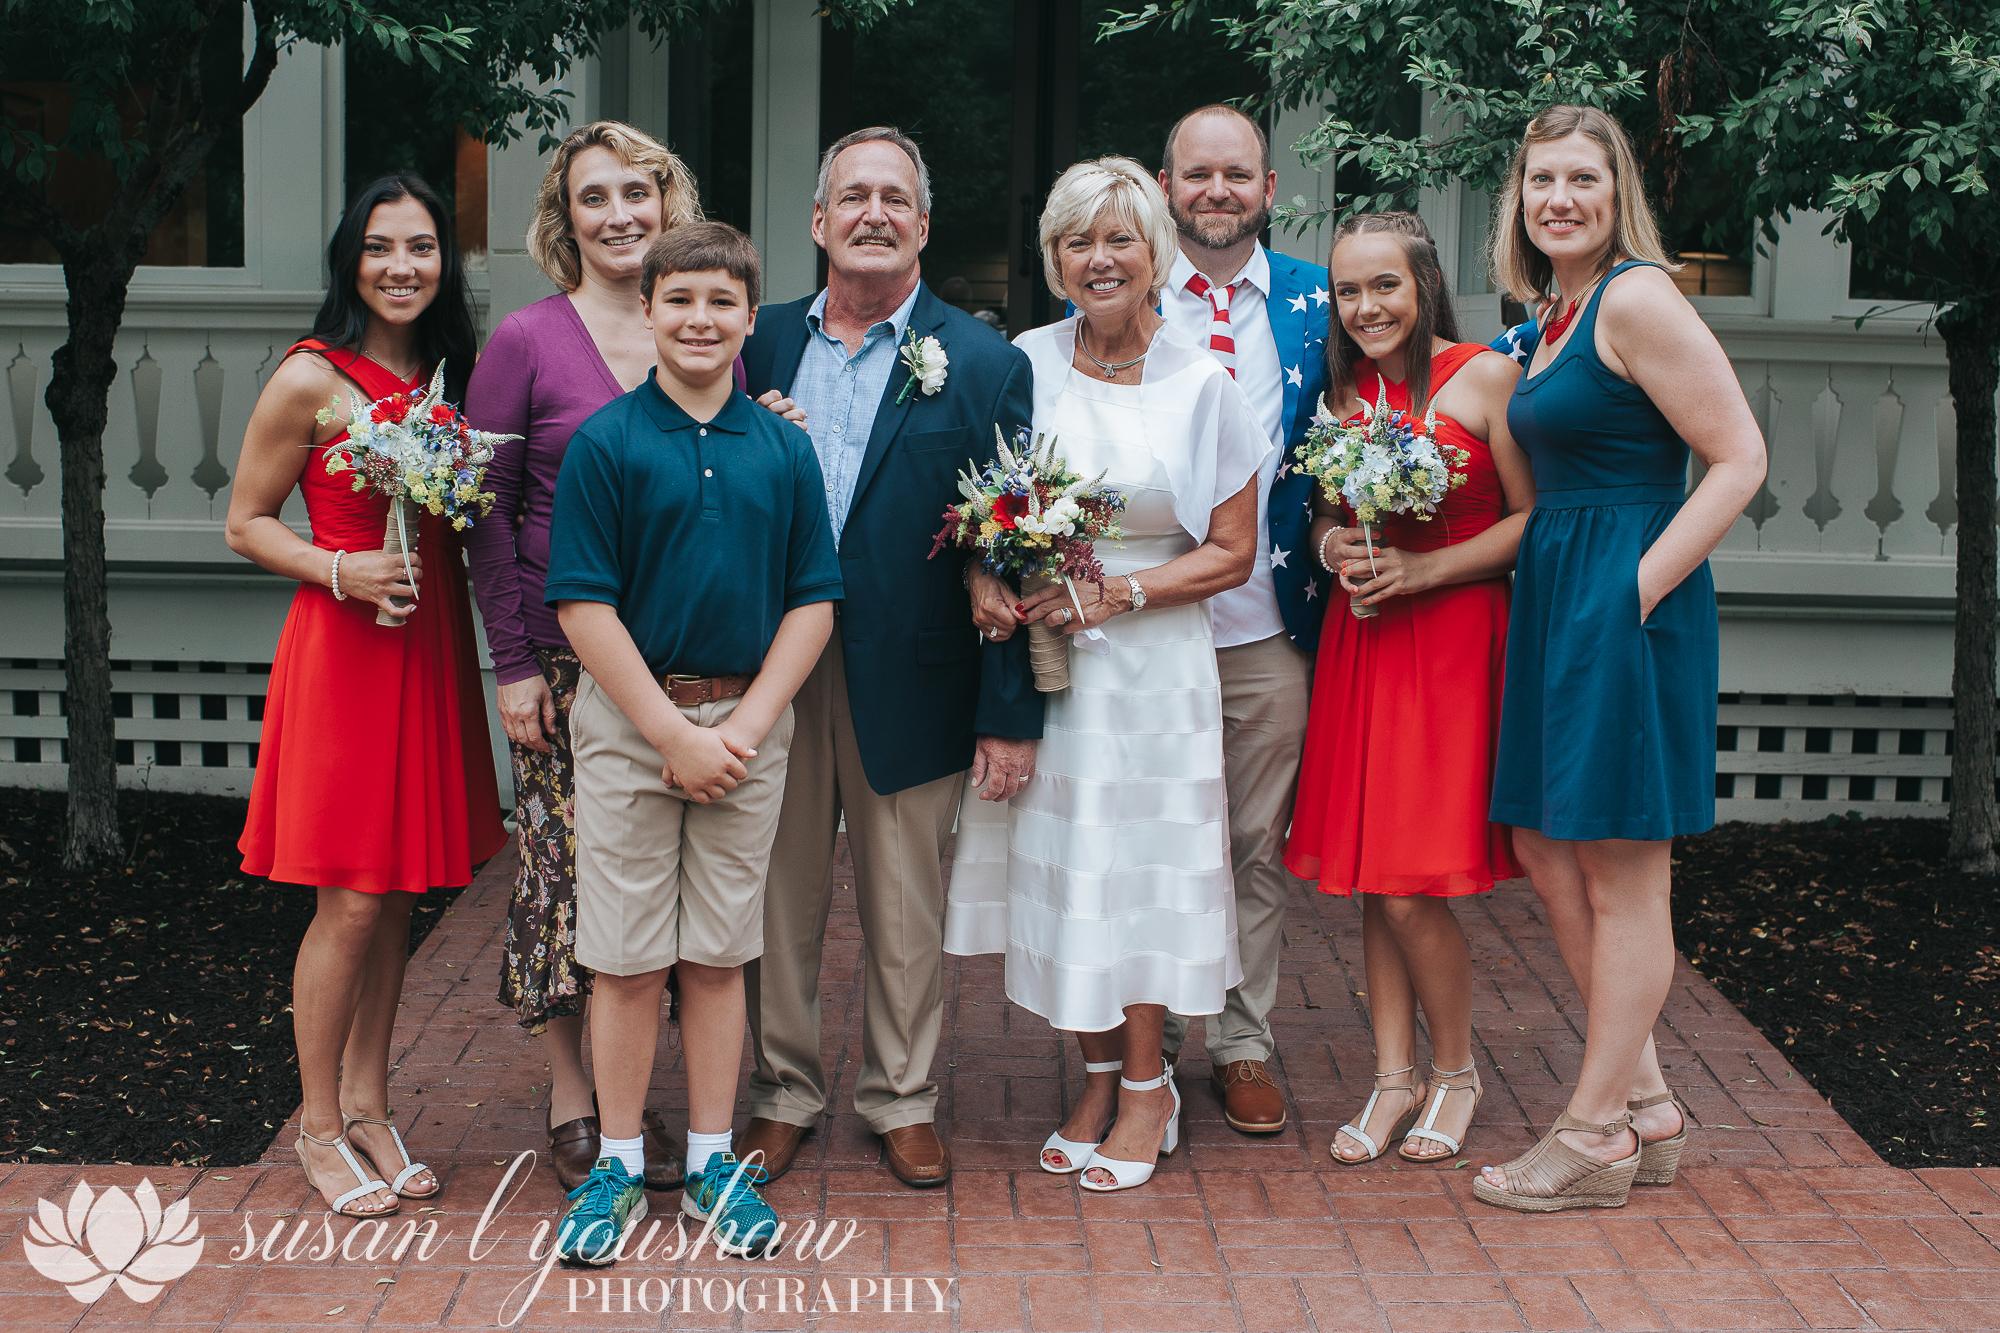 BLOG Carolyn Adams and Jim McCune 07-04-2018 SLY Photography-112.jpg